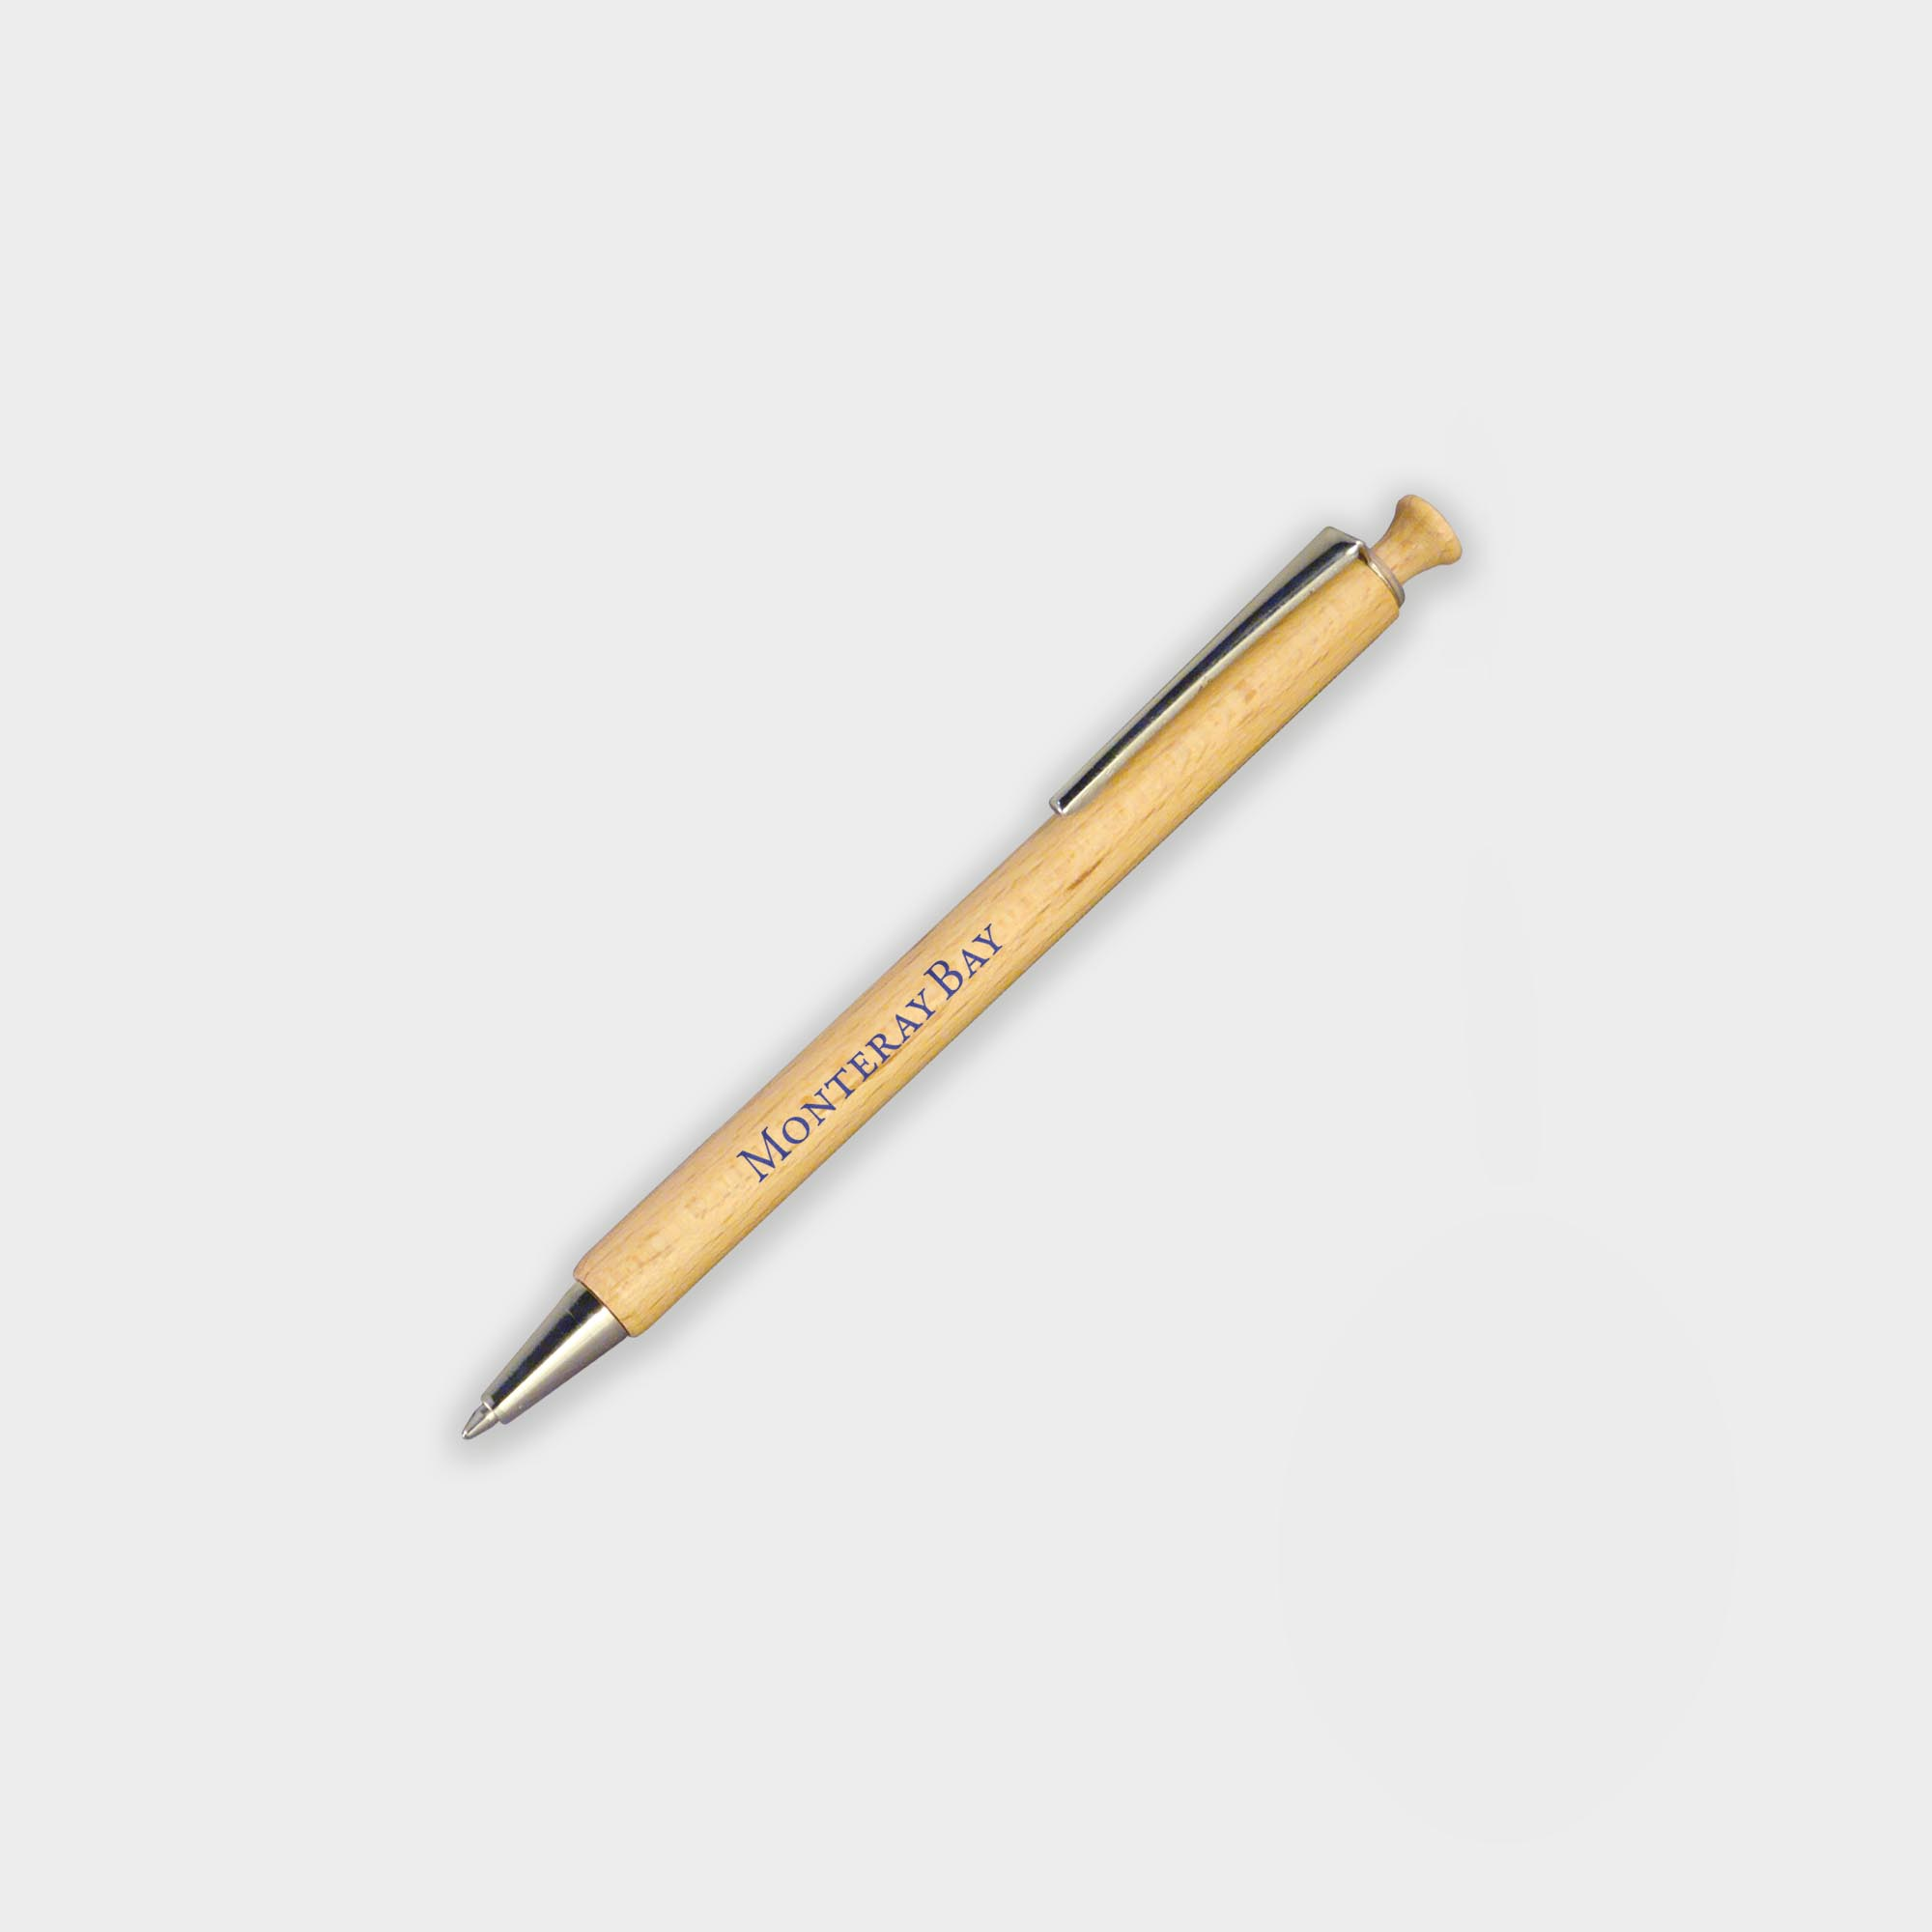 Promotional Spar Sustainable Wood Pen